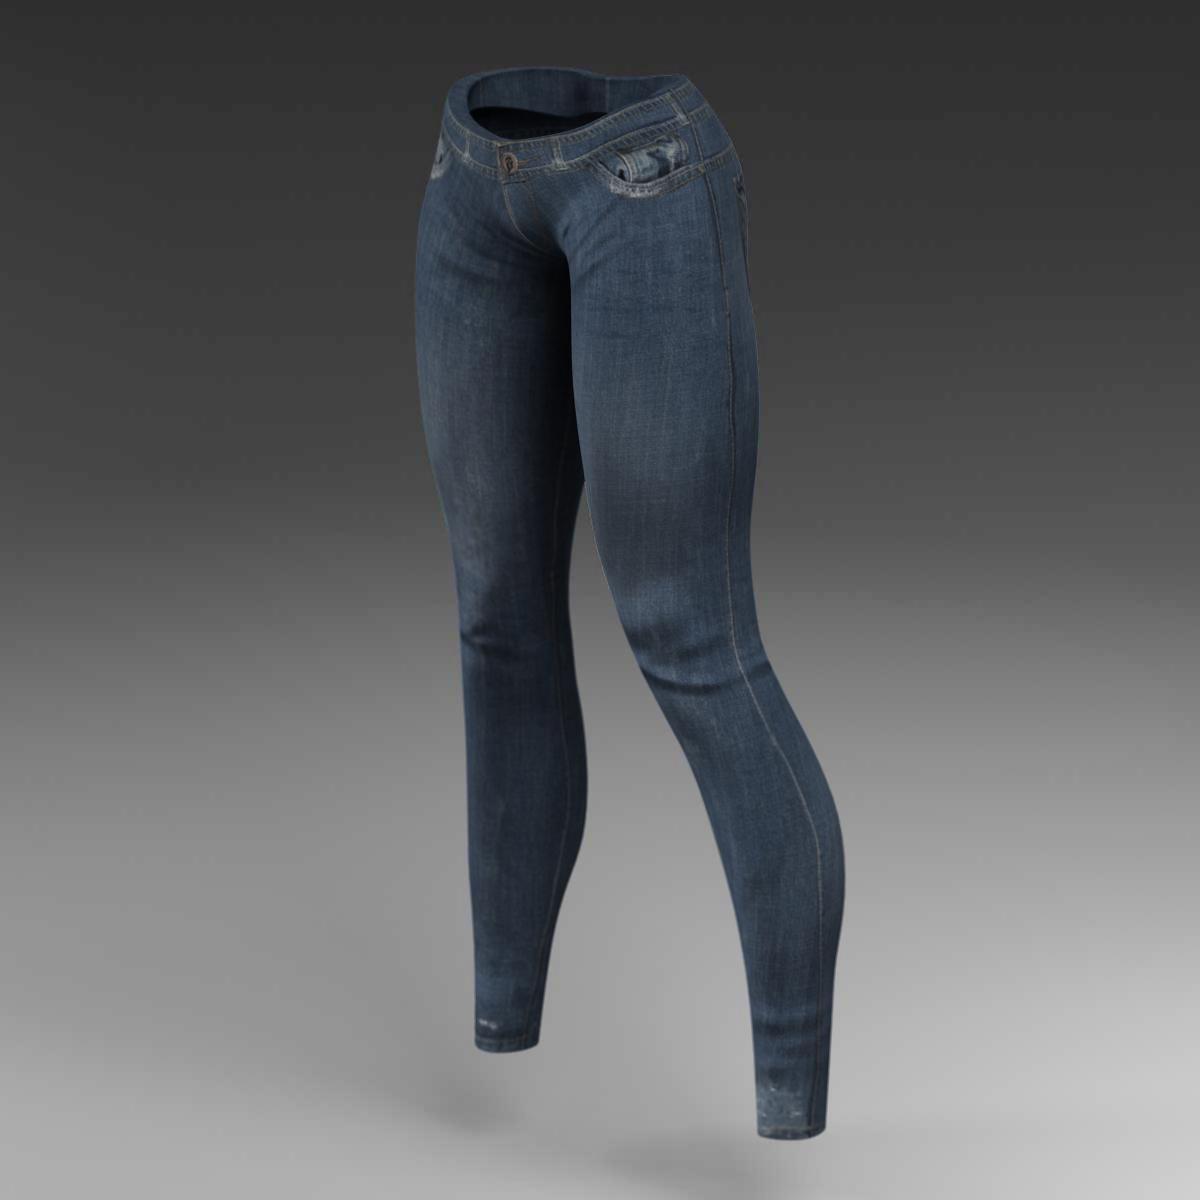 Female jeans 3d model 3ds max fbx c4d ma mb obj 160401